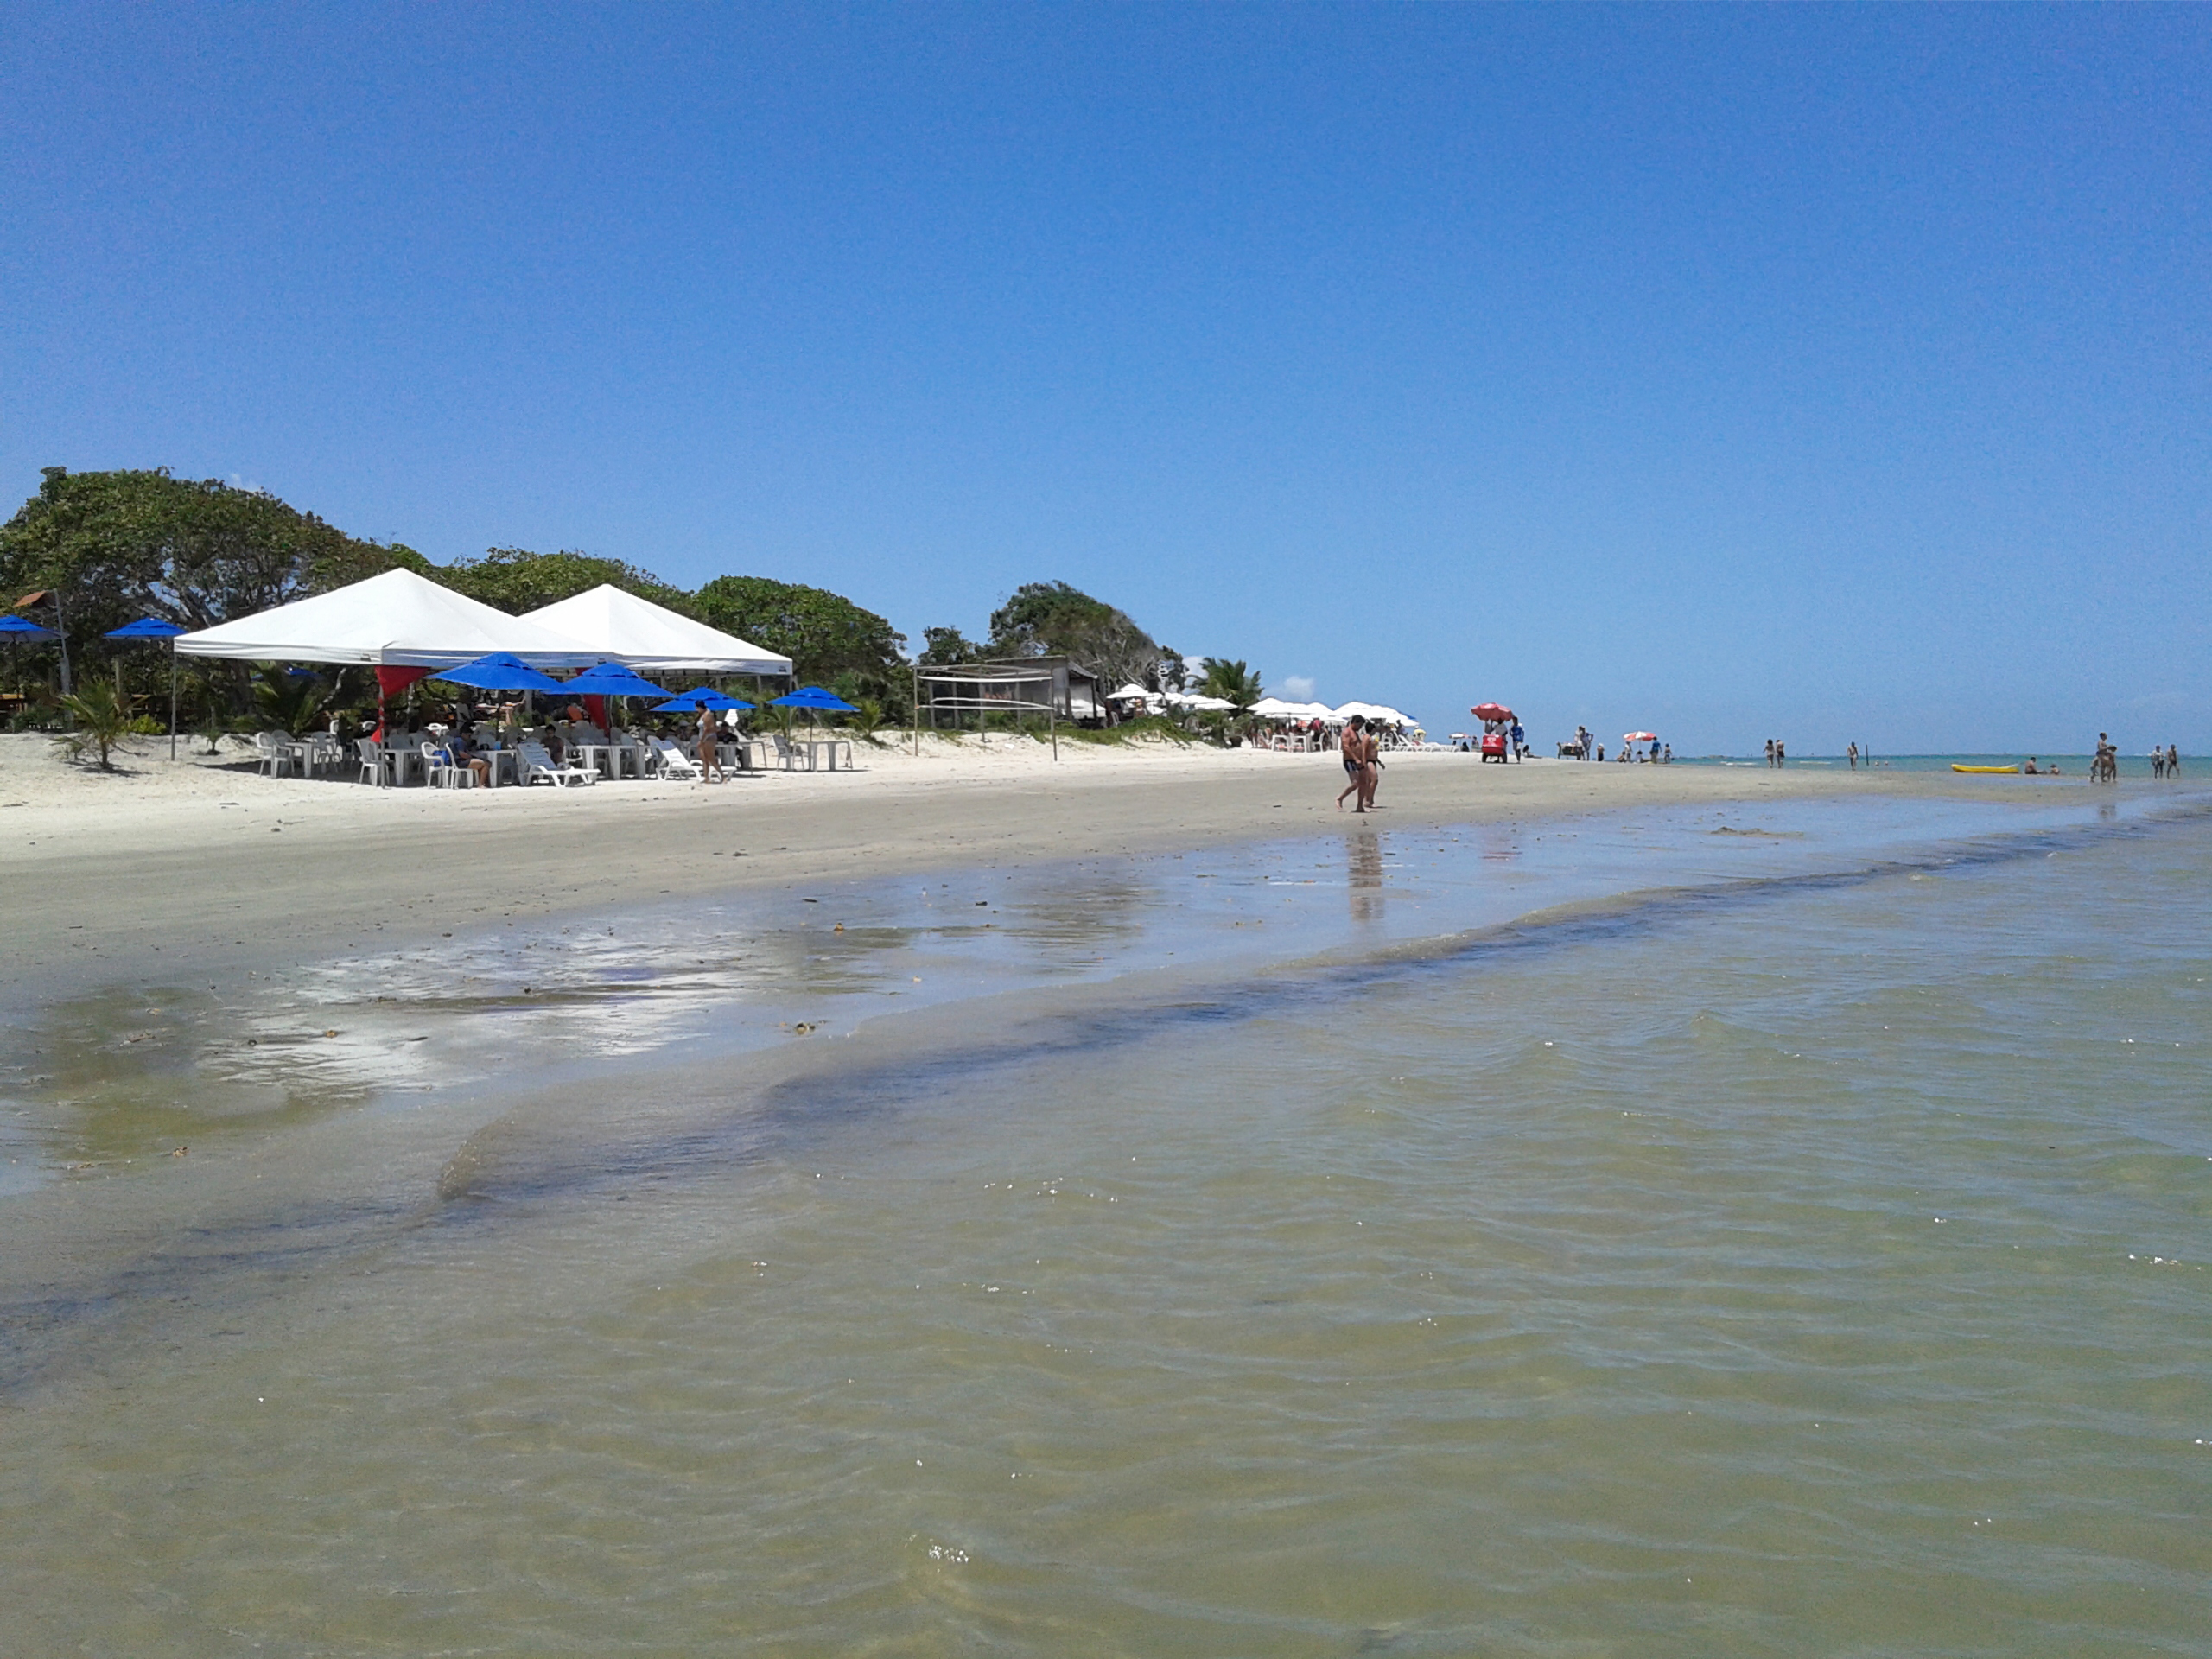 Santa Cruz Cabrália Bahia fonte: upload.wikimedia.org